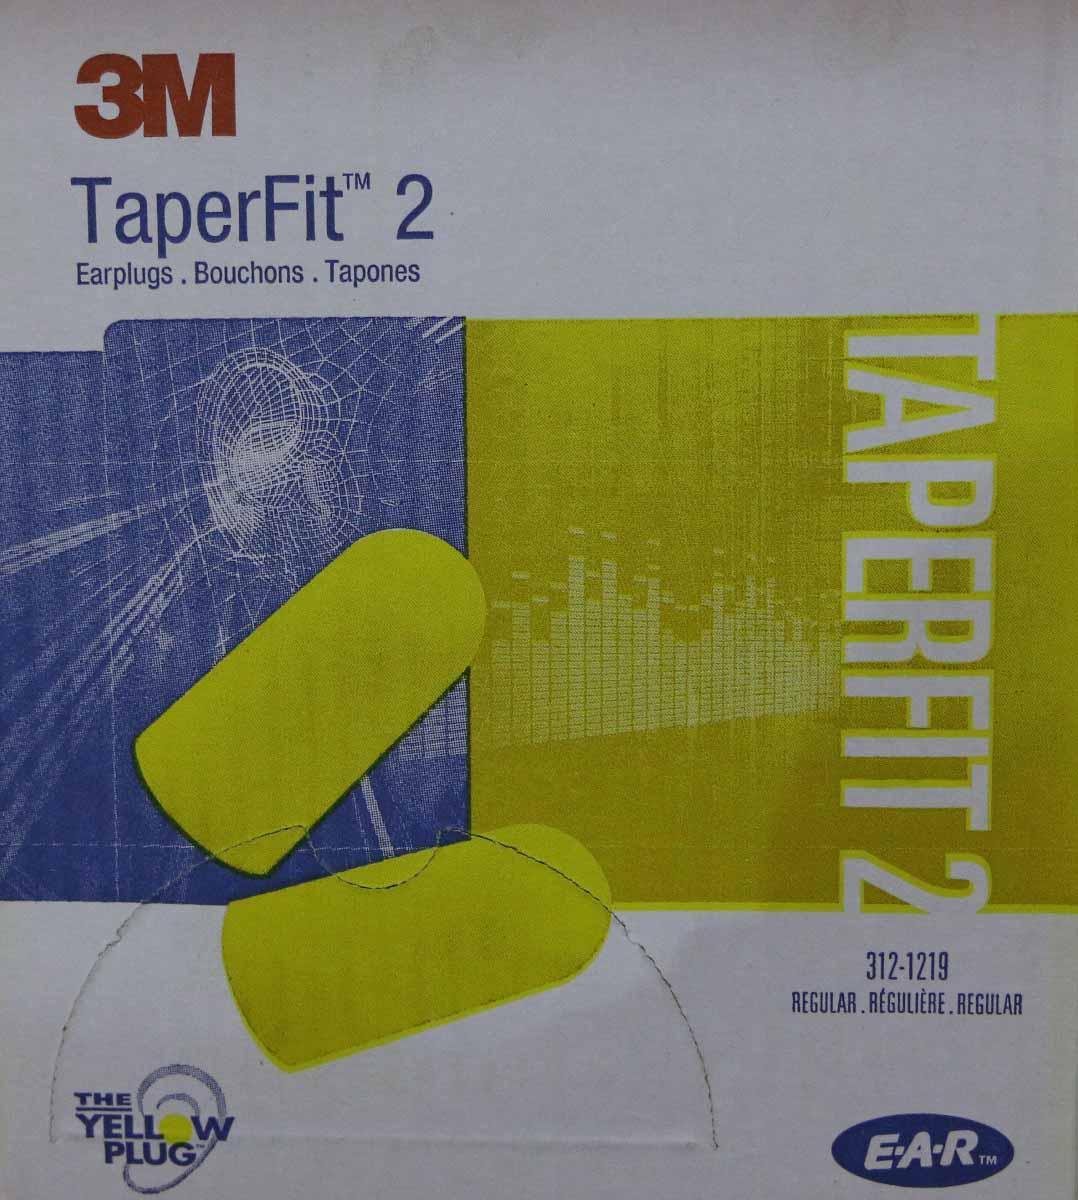 3M TaperFit2 Single-Use Ear plugs